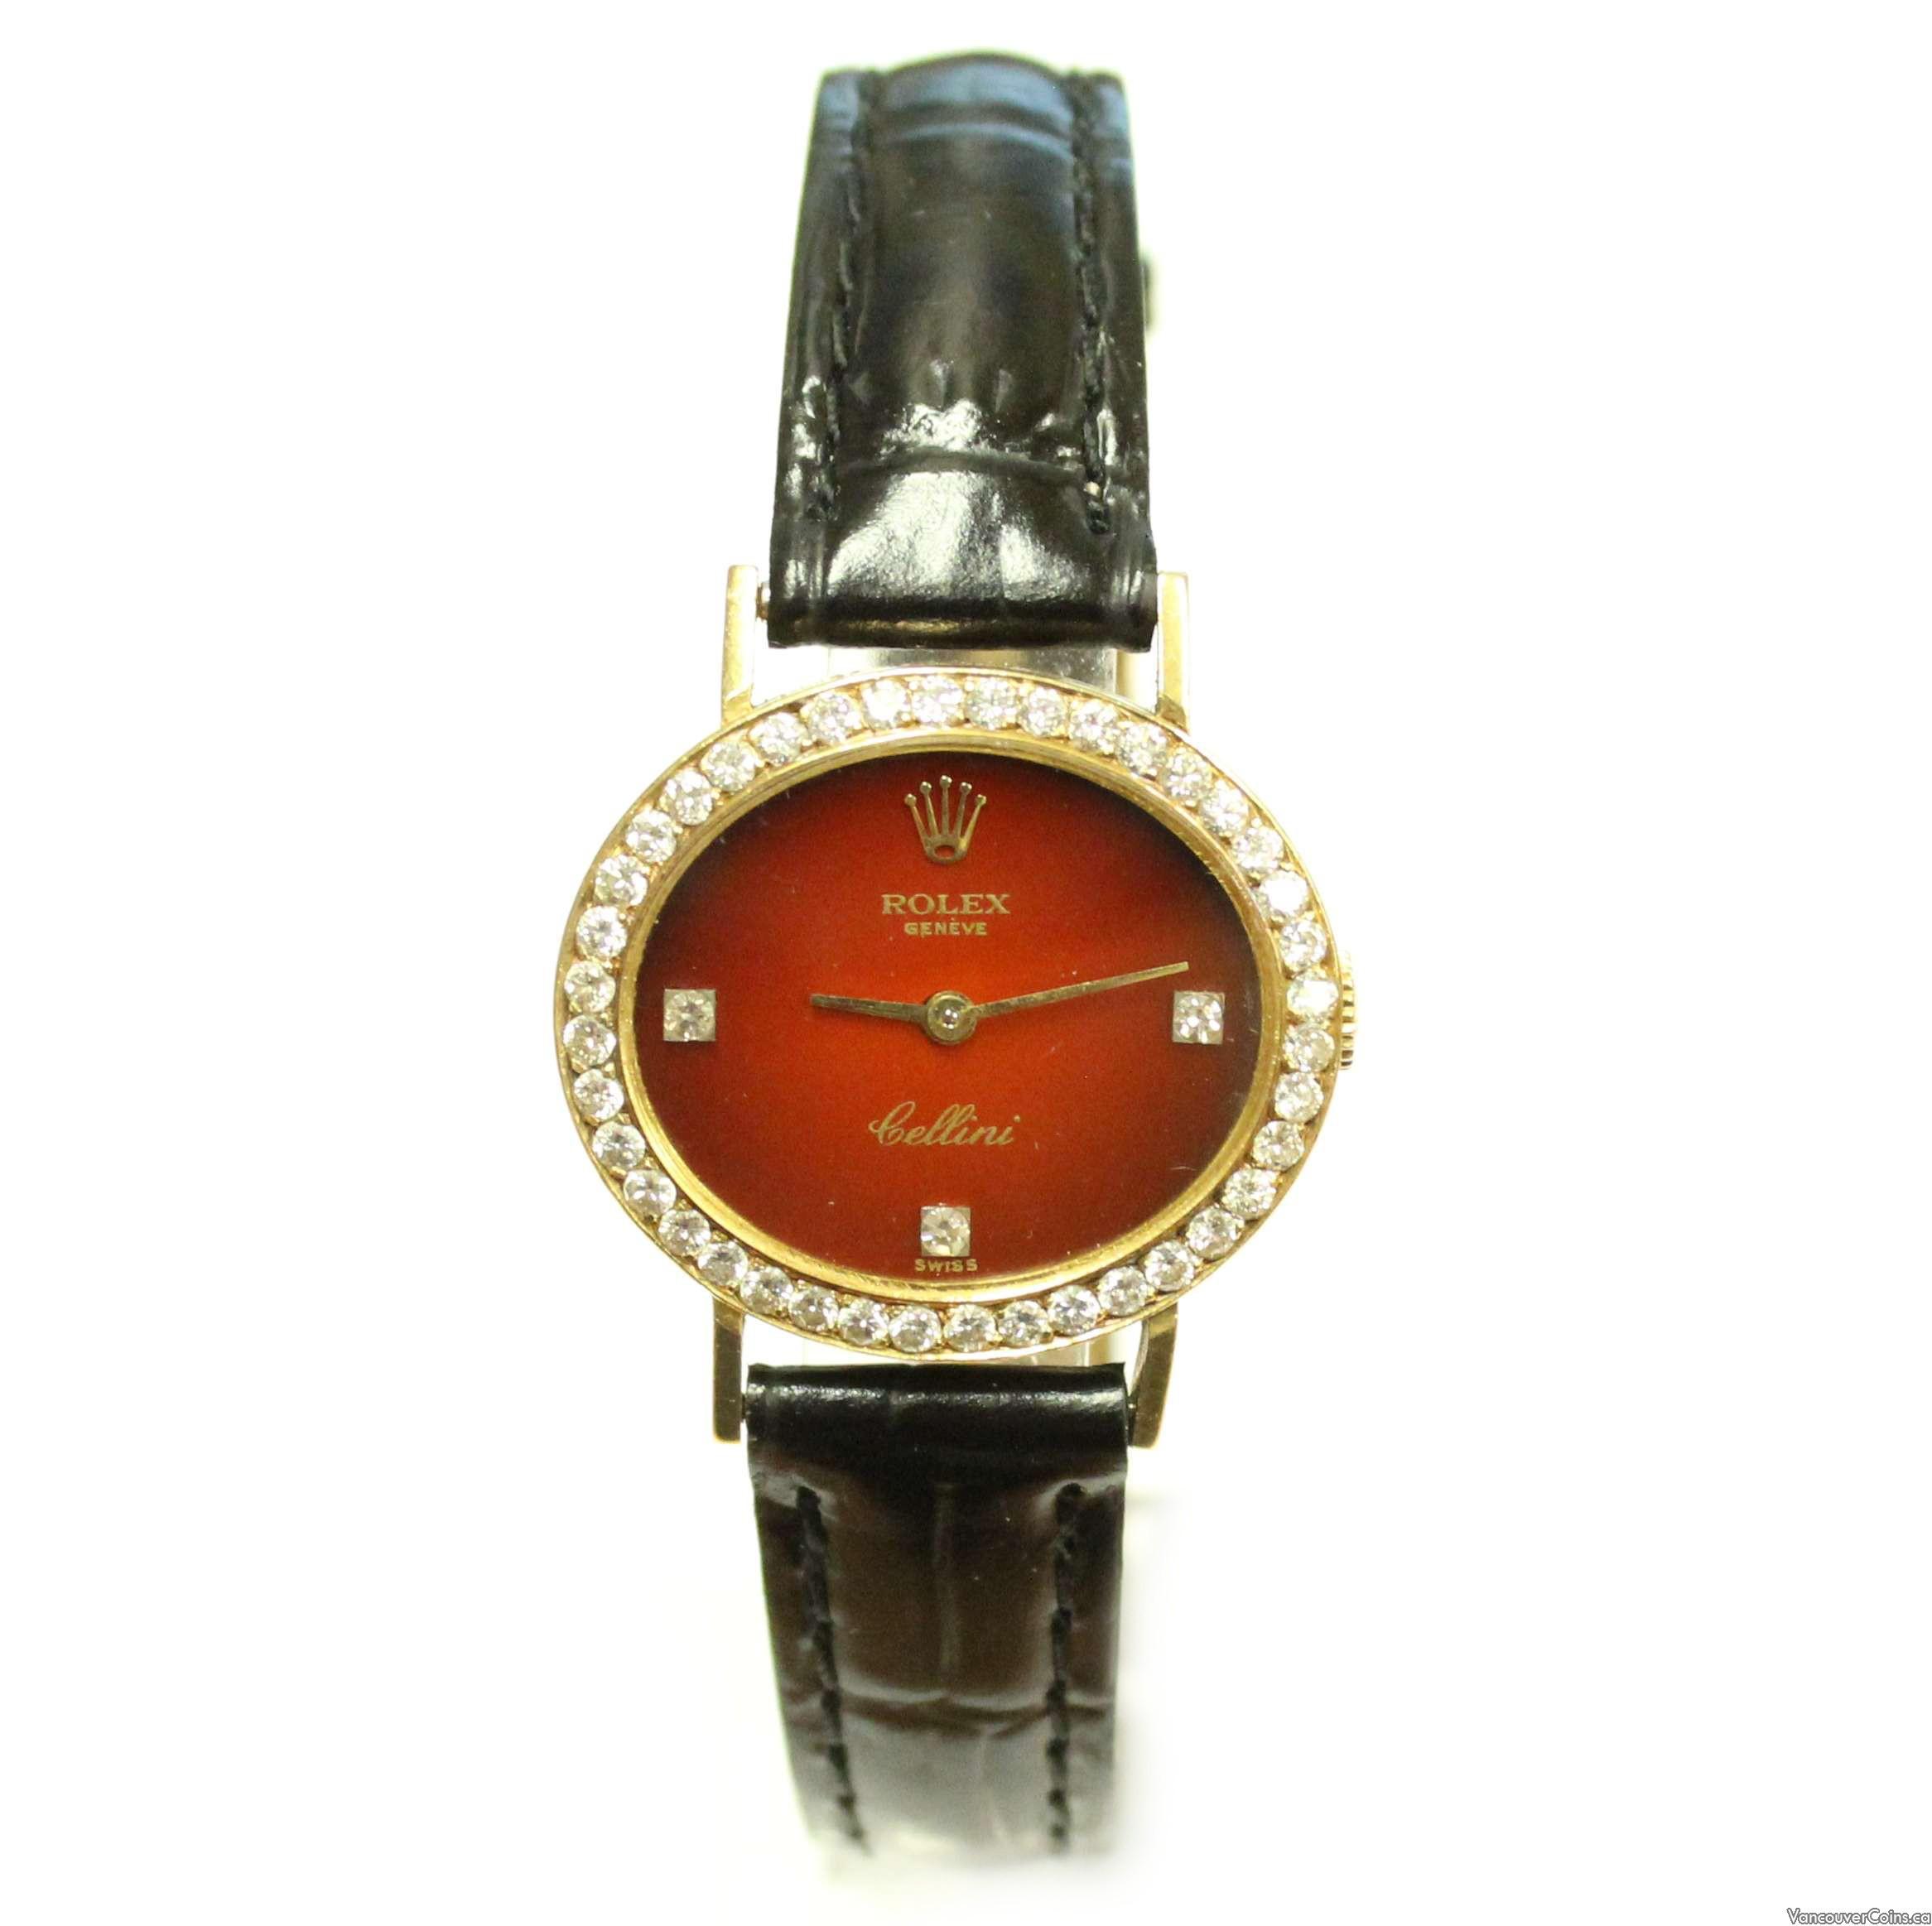 1981 Rolex Cellini 4081 18k gold diamond bezel & burgundy dial